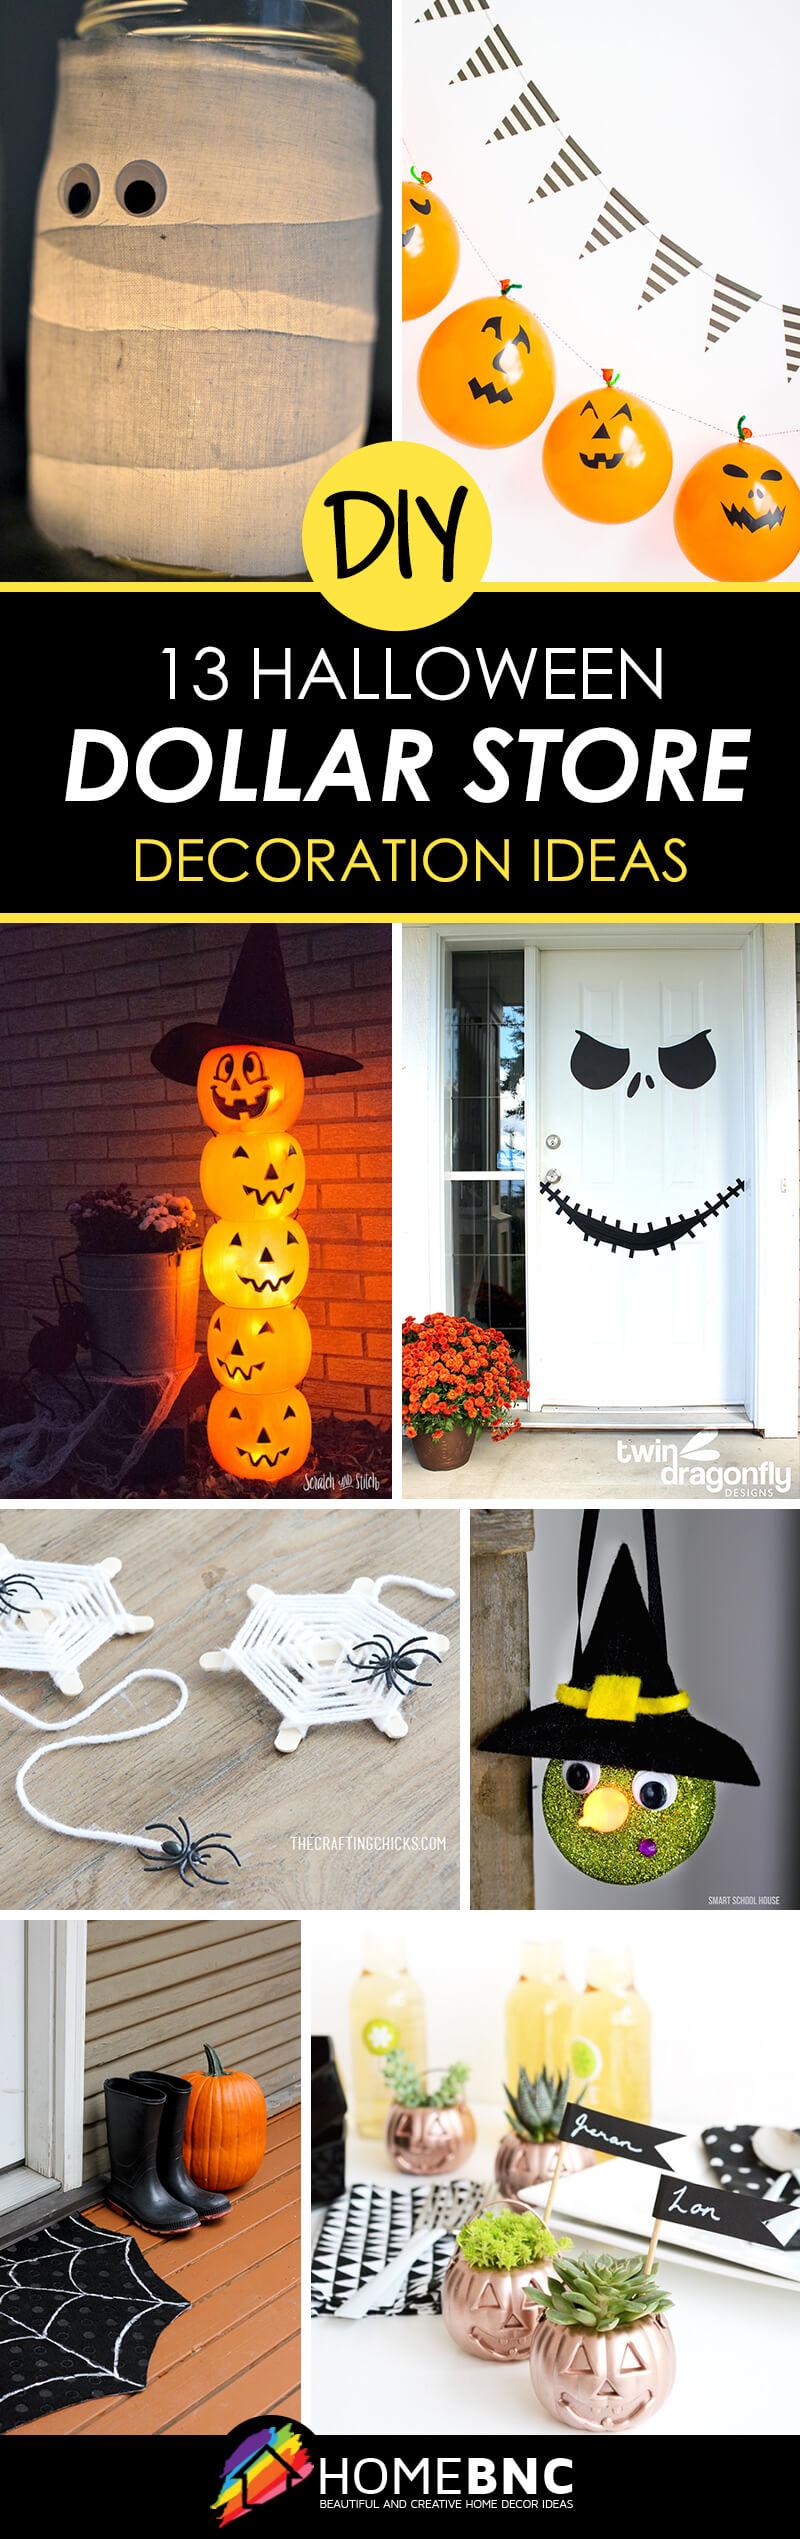 13 Best DIY Dollar Store Halloween Decoration Ideas and